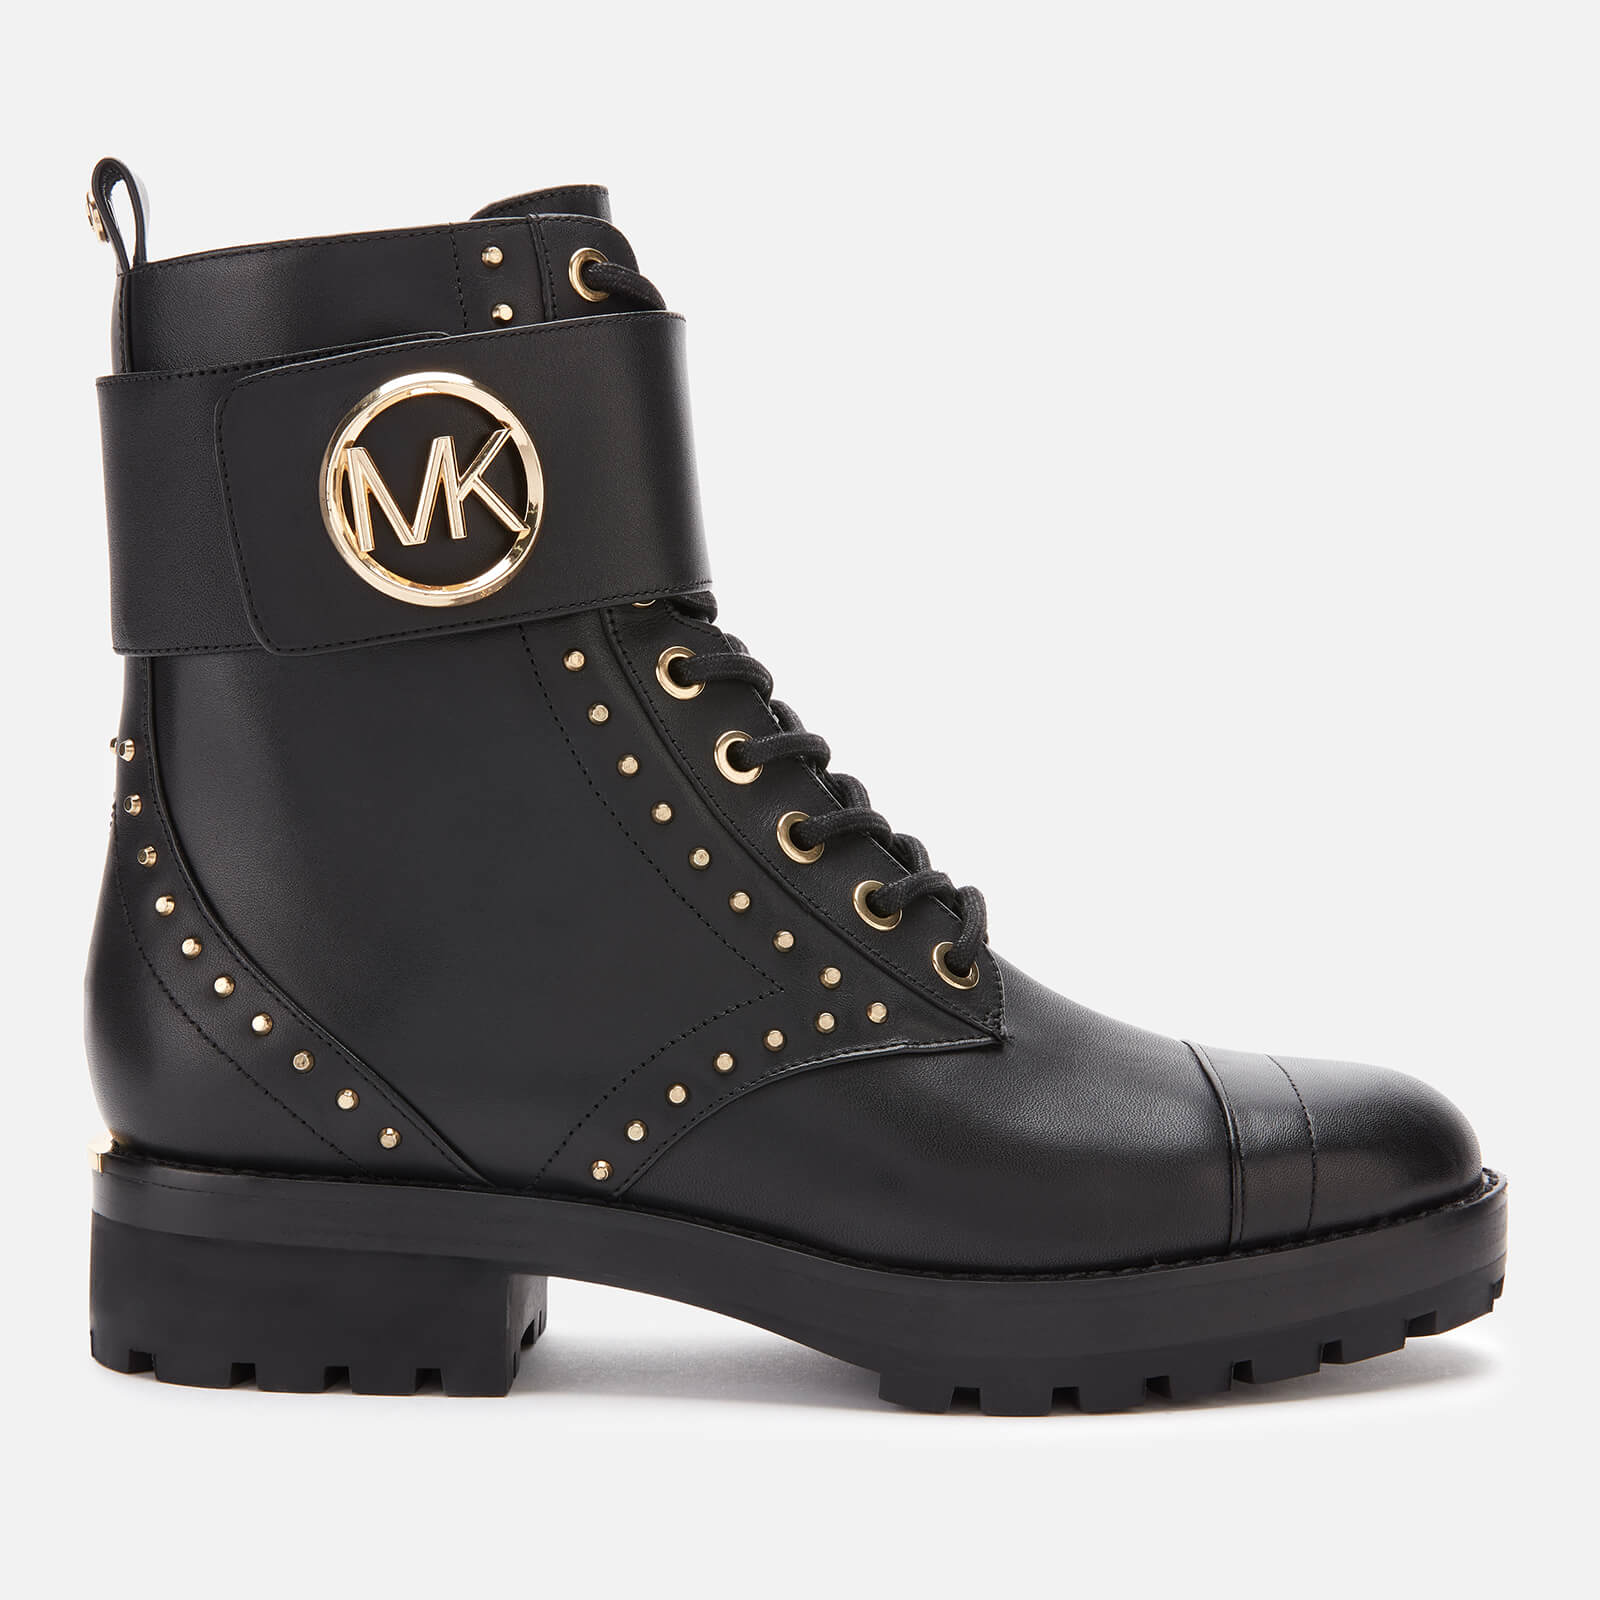 Tatum Leather Lace-up Boots - Black